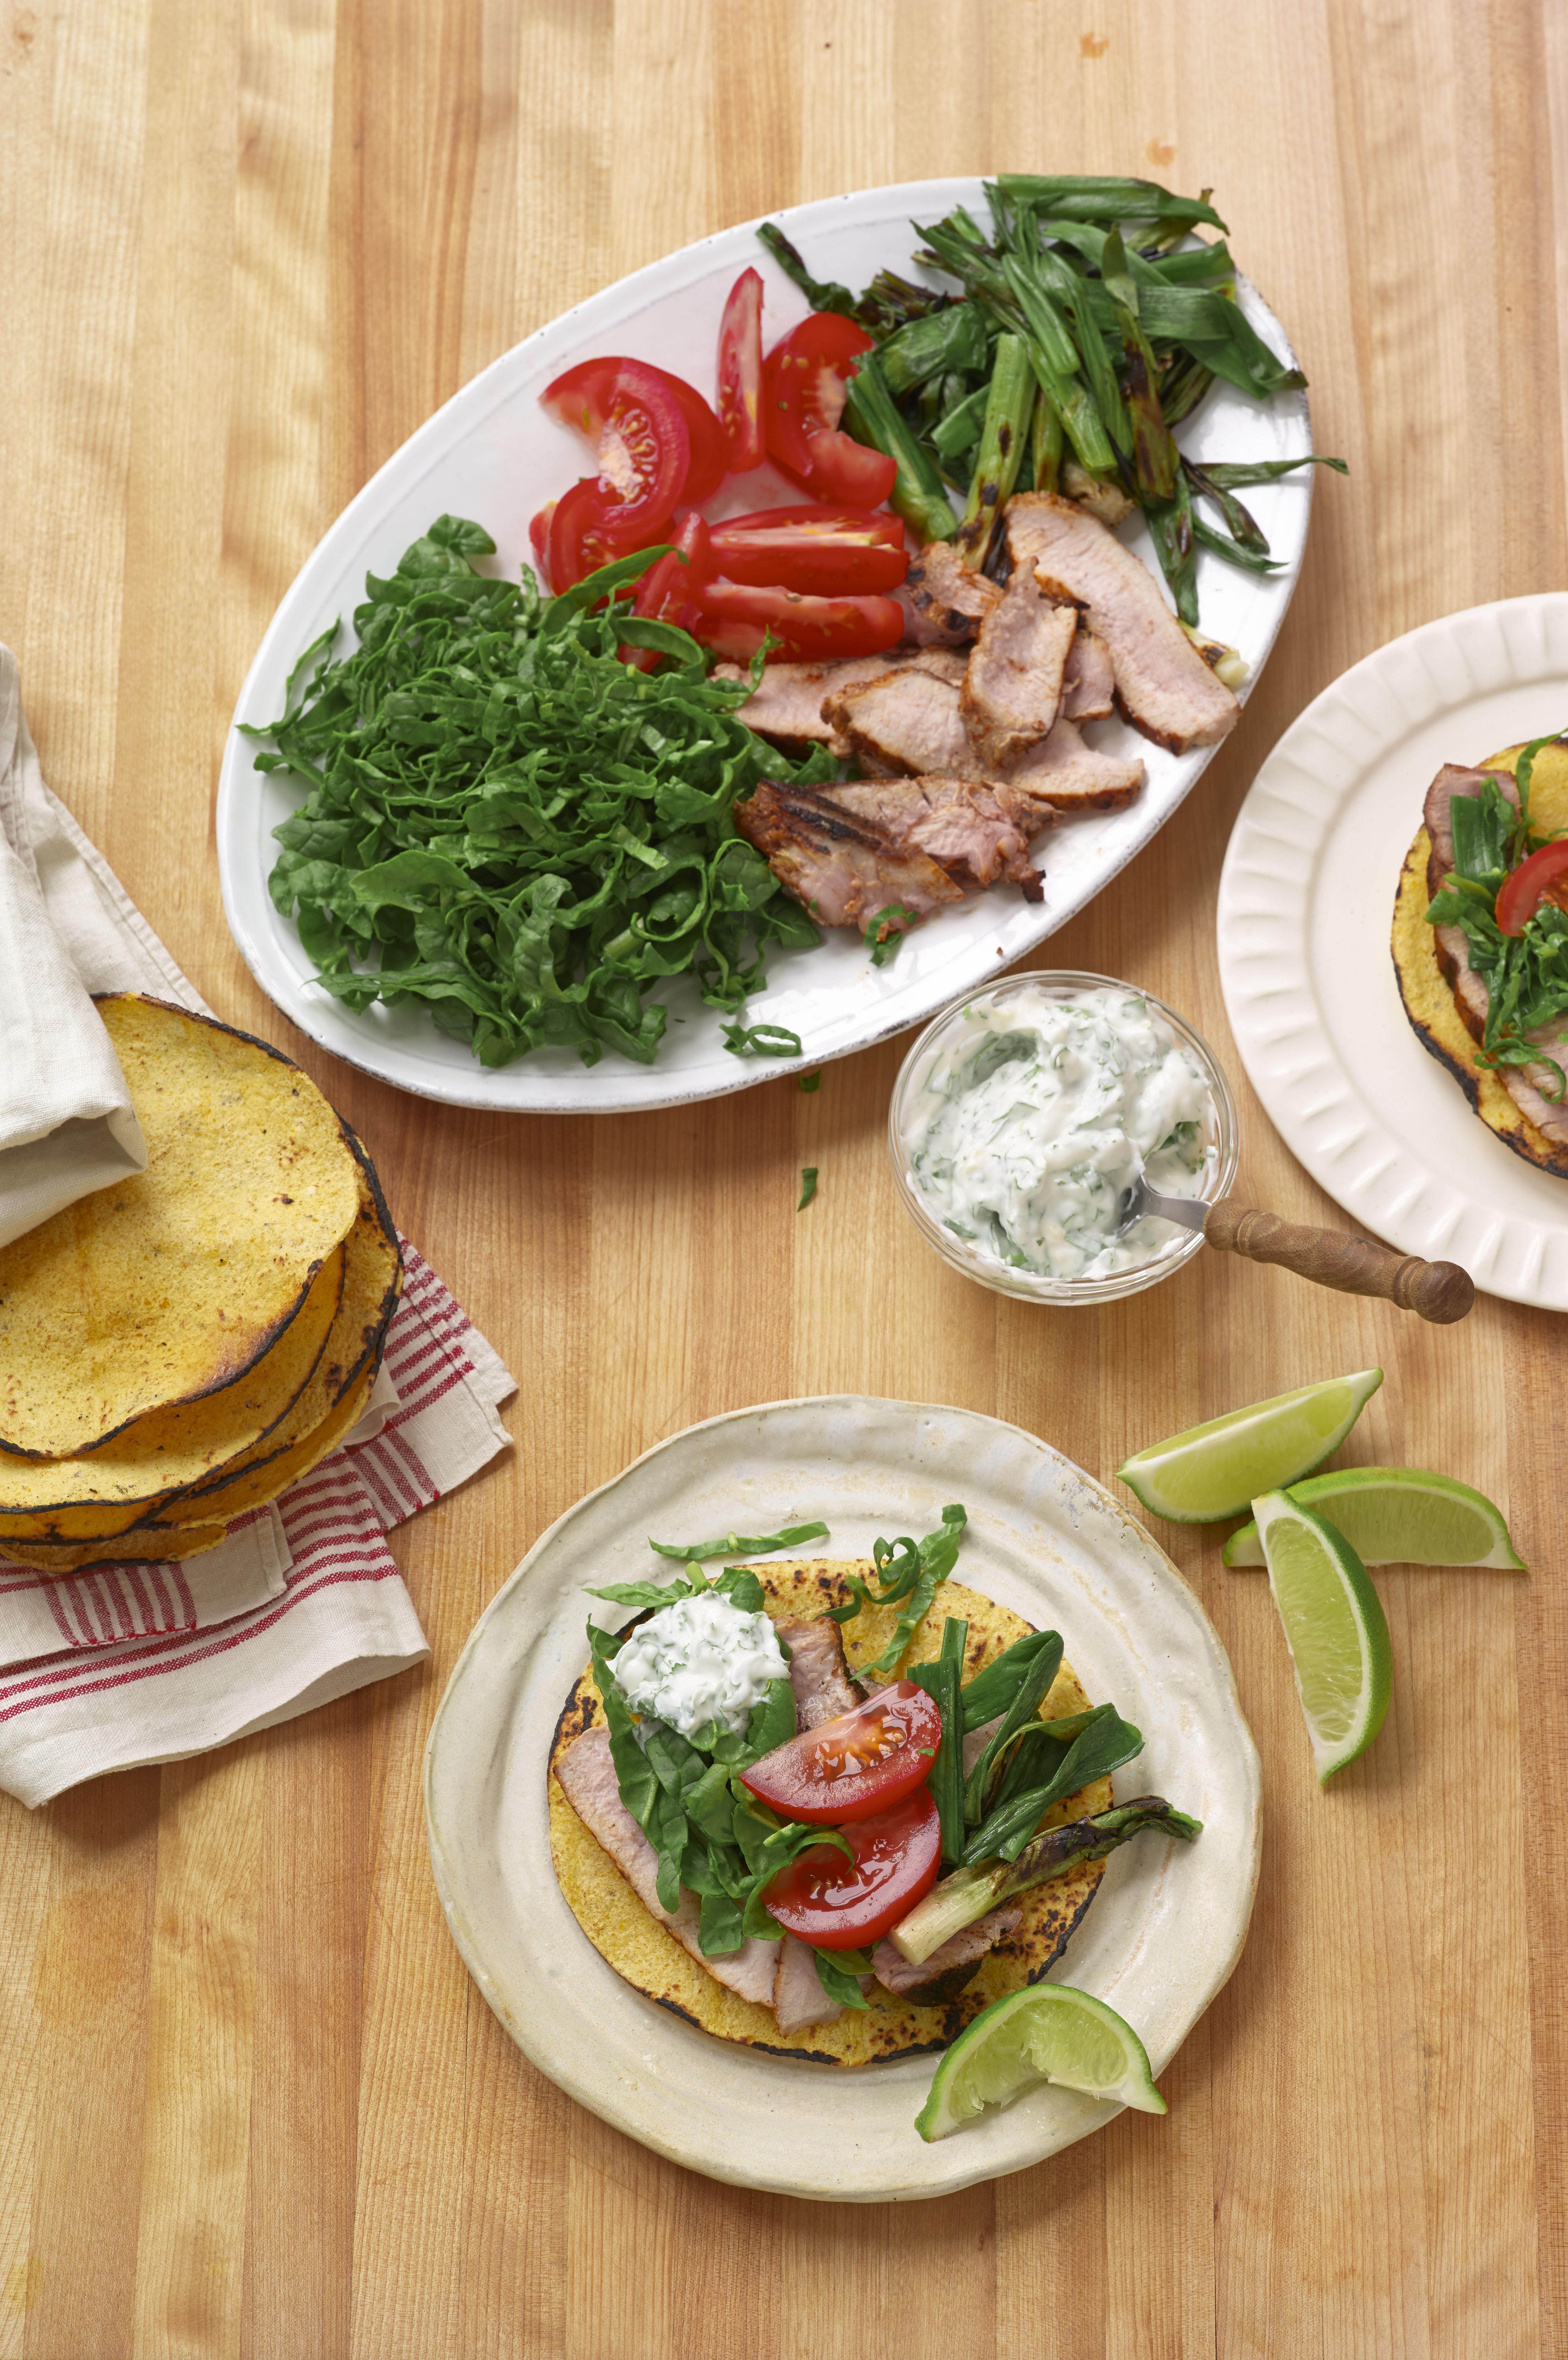 American Heart Association Heart Healthy Recipes  4 Heart Healthy Recipes From the American Heart